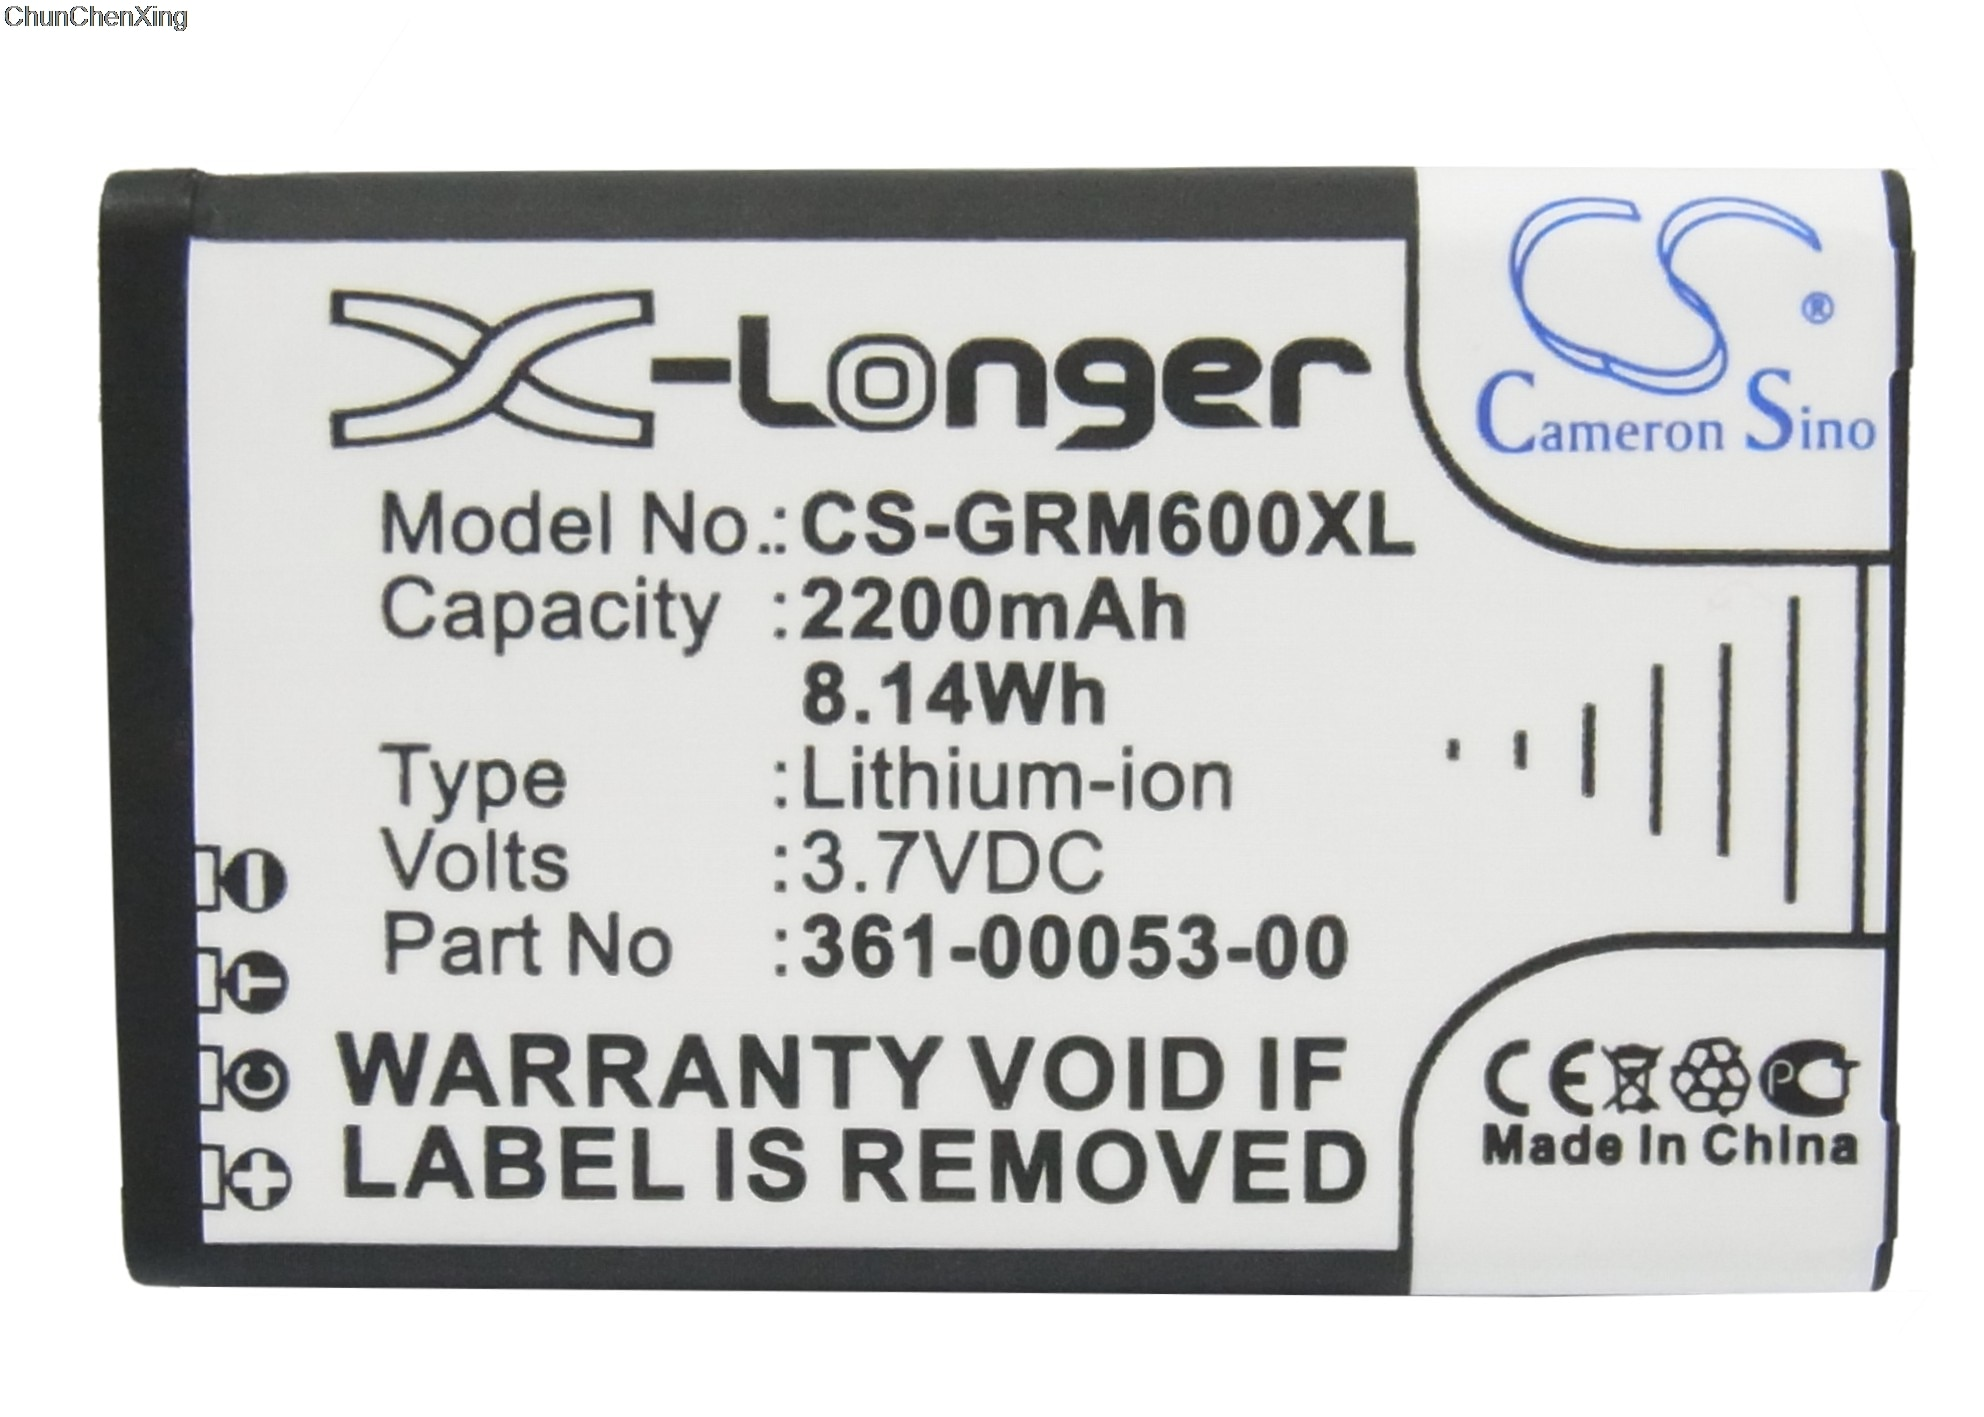 Cameron Sino batería de 2200mAh-361-00053-00 para Garmin alfa 100 de mano de Montana 600 de 600T de 600t de camuflaje 650 de 650T.